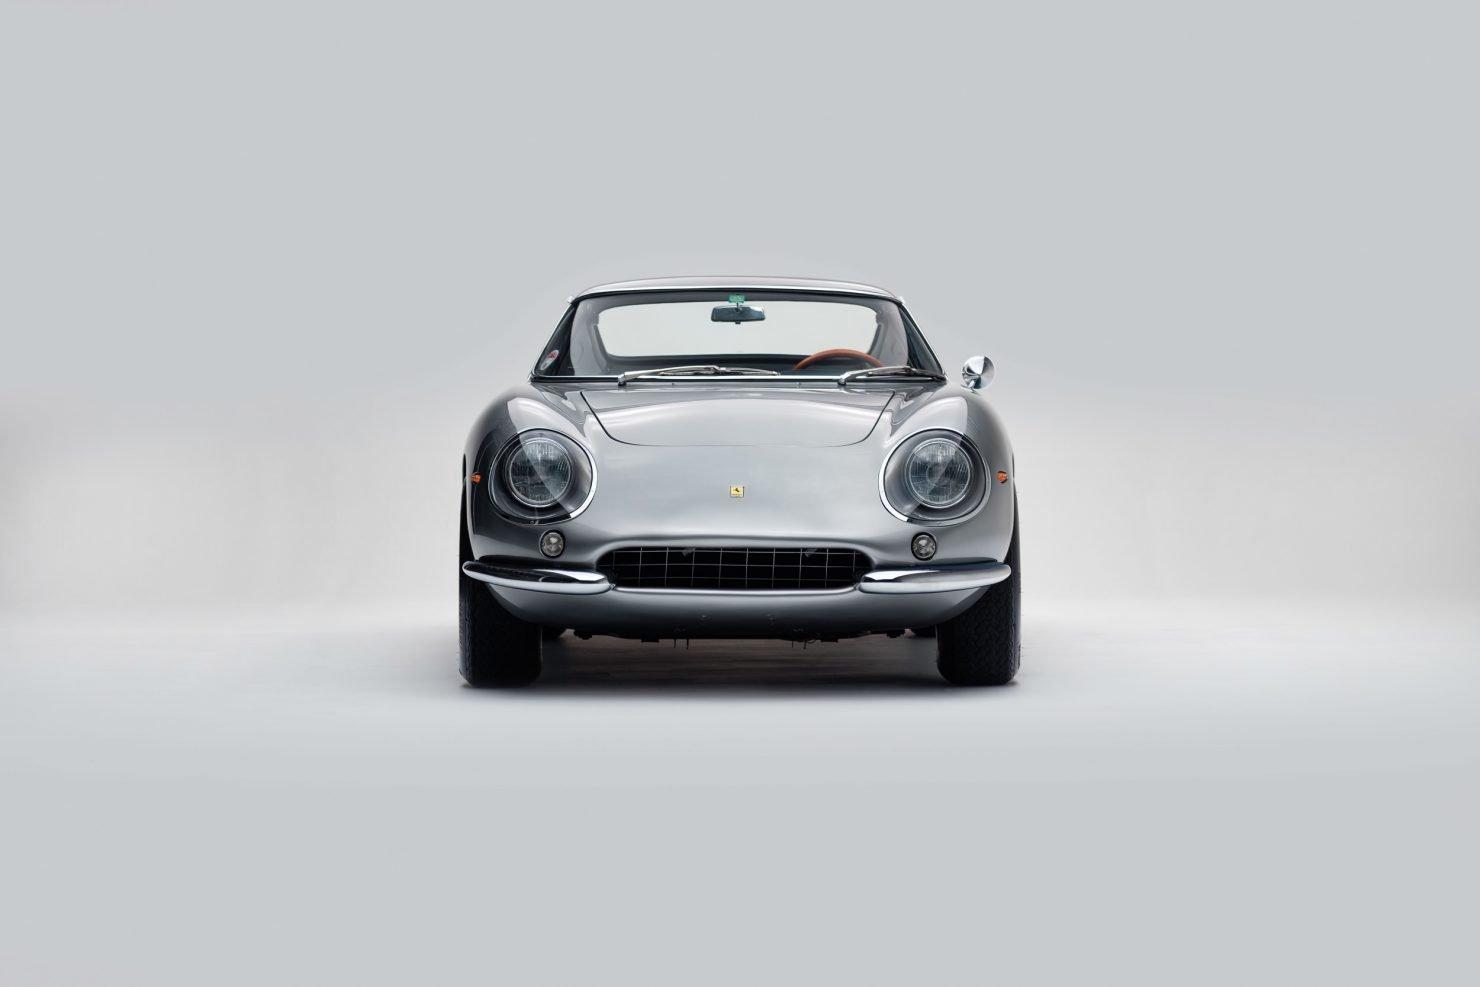 ferrari 275 gtb car 9 1480x987 - 1965 Ferrari 275 GTB/6C Alloy